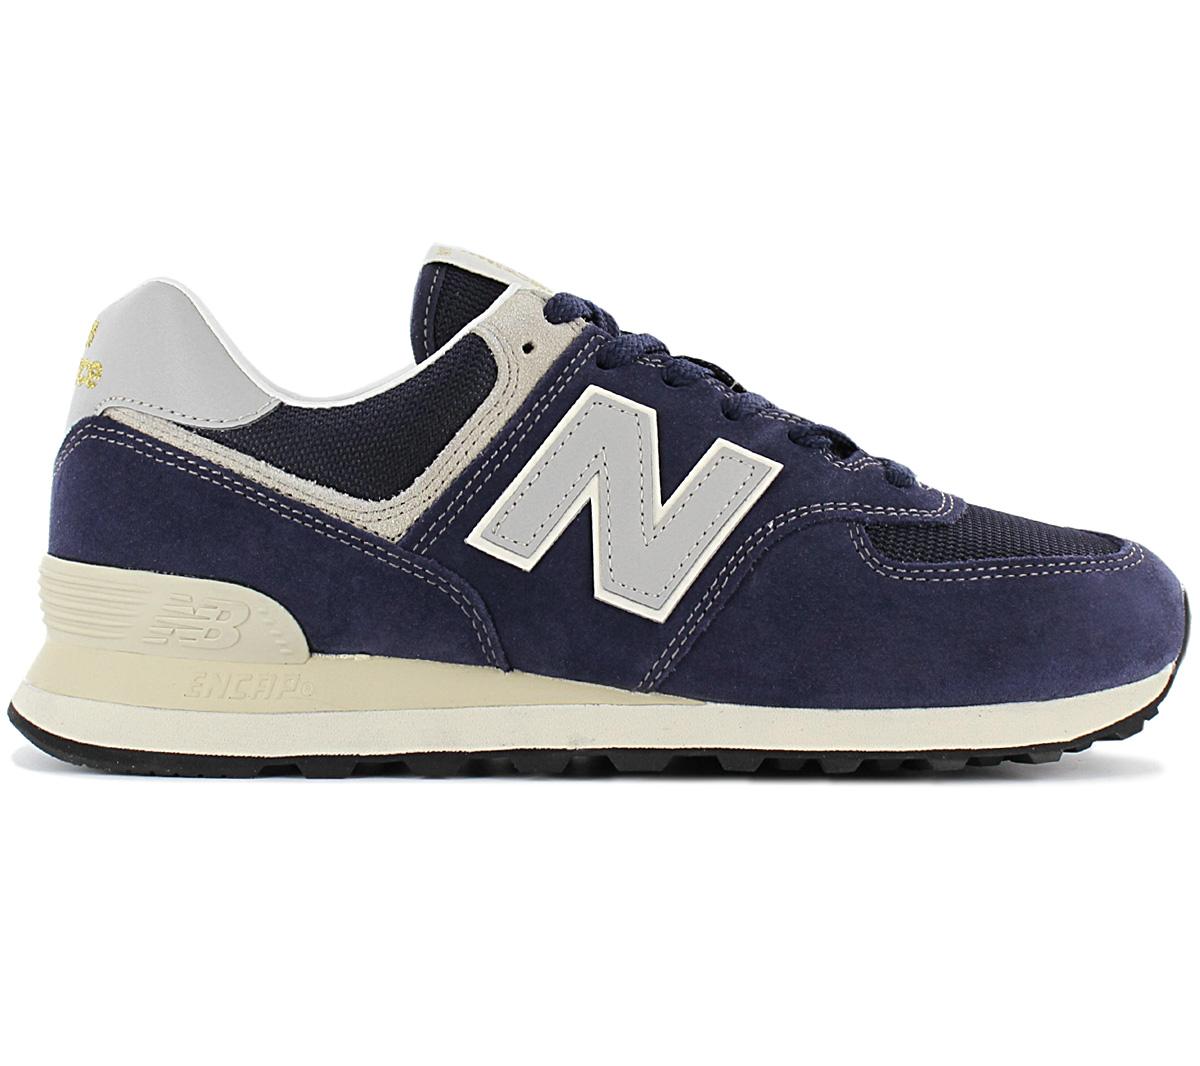 Details about New balance Classics 574 ML574VLA Men's Sneaker Blue Shoes Trainers Sports Shoes